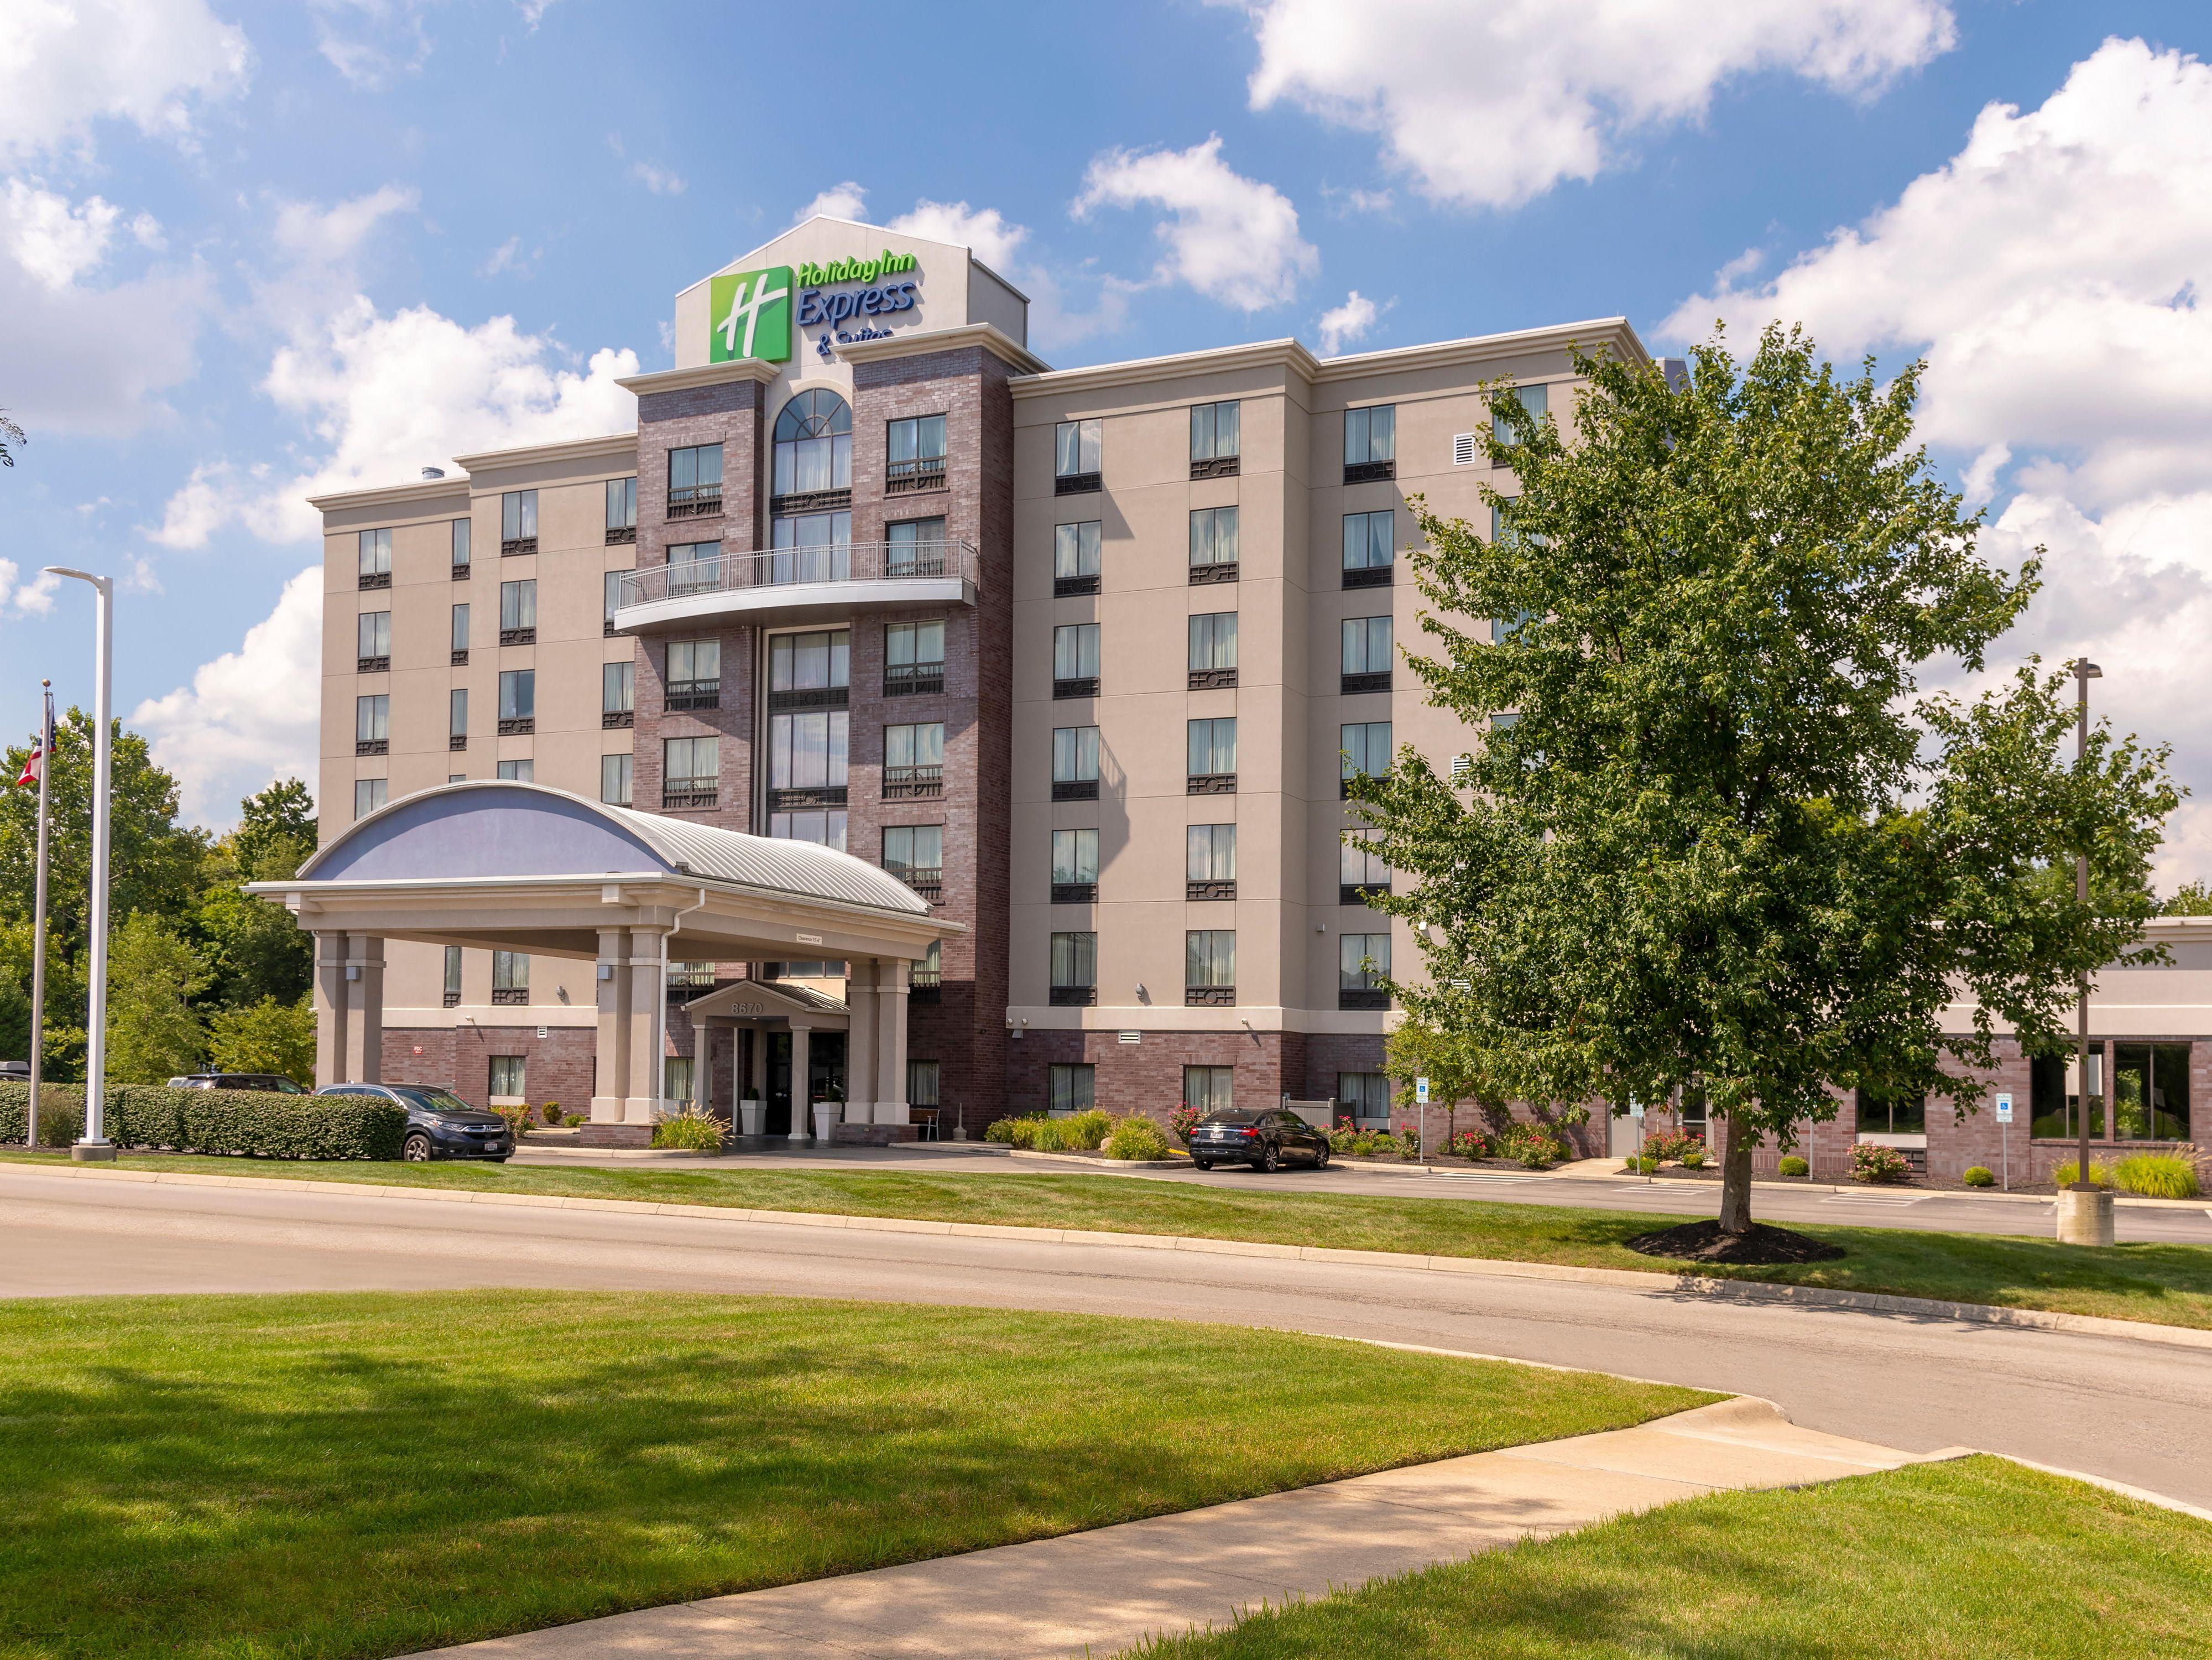 Holiday Inn Express & Suites Columbus Polaris Parkway Hotel by IHG